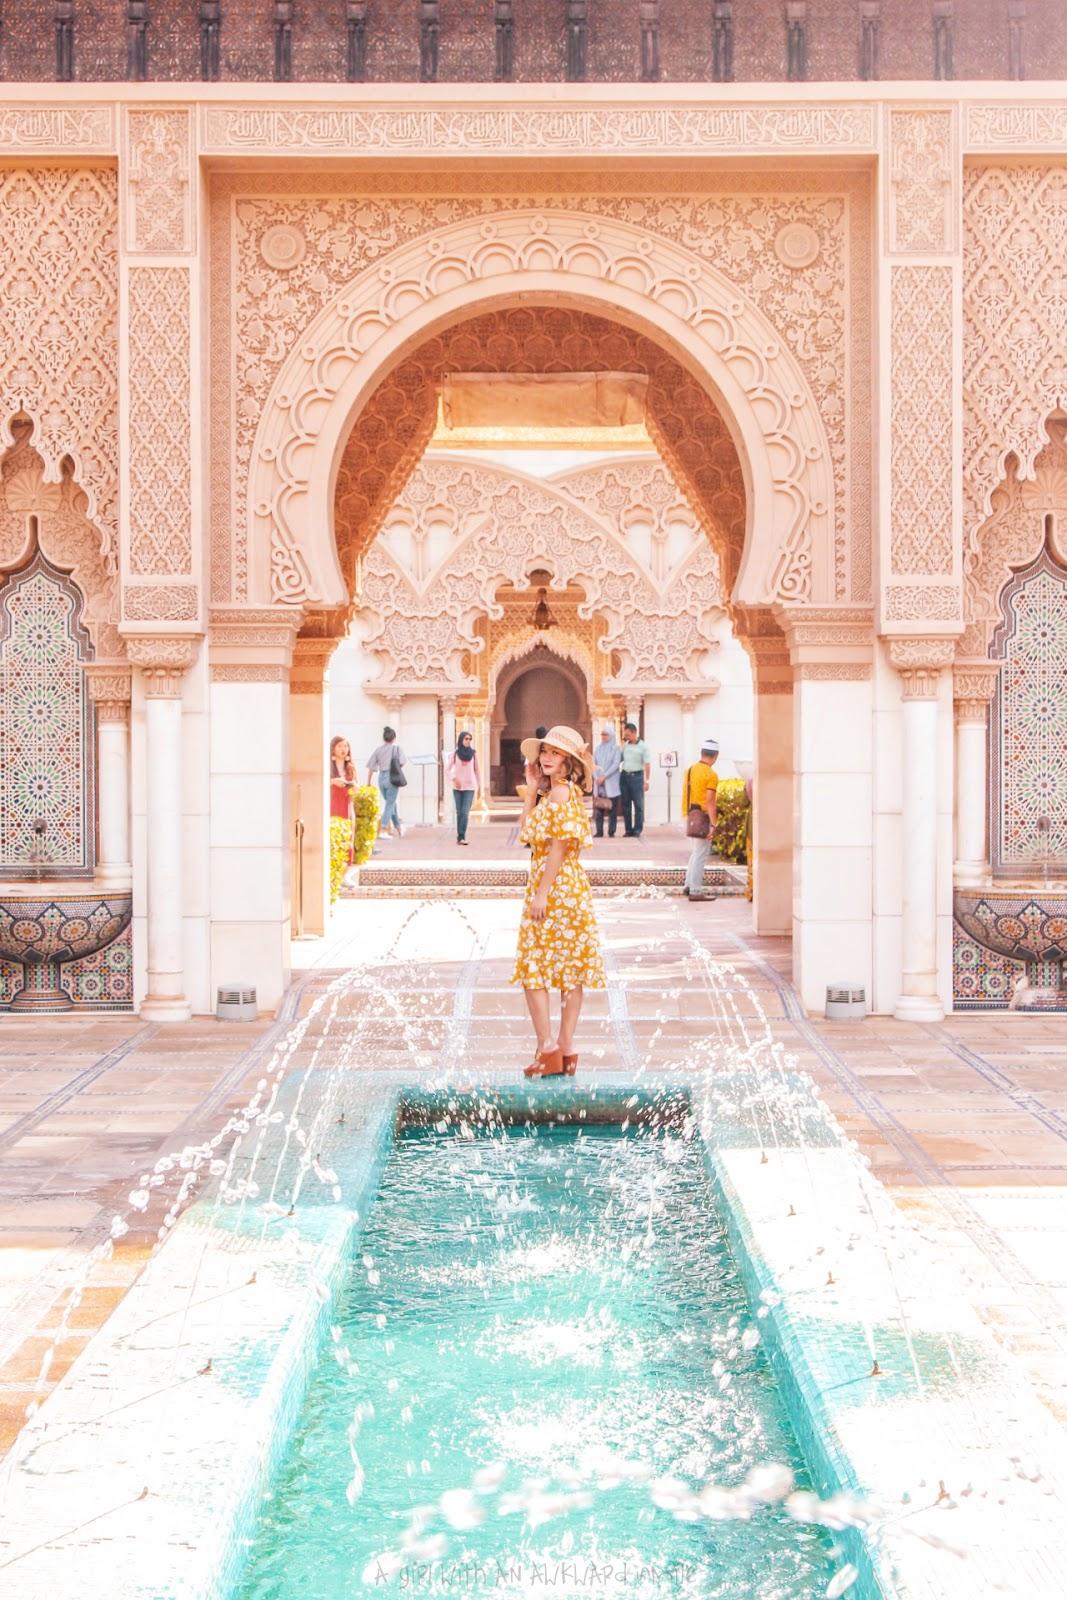 Moroccan Pavilion Putrajaya (Astaka Morocco)